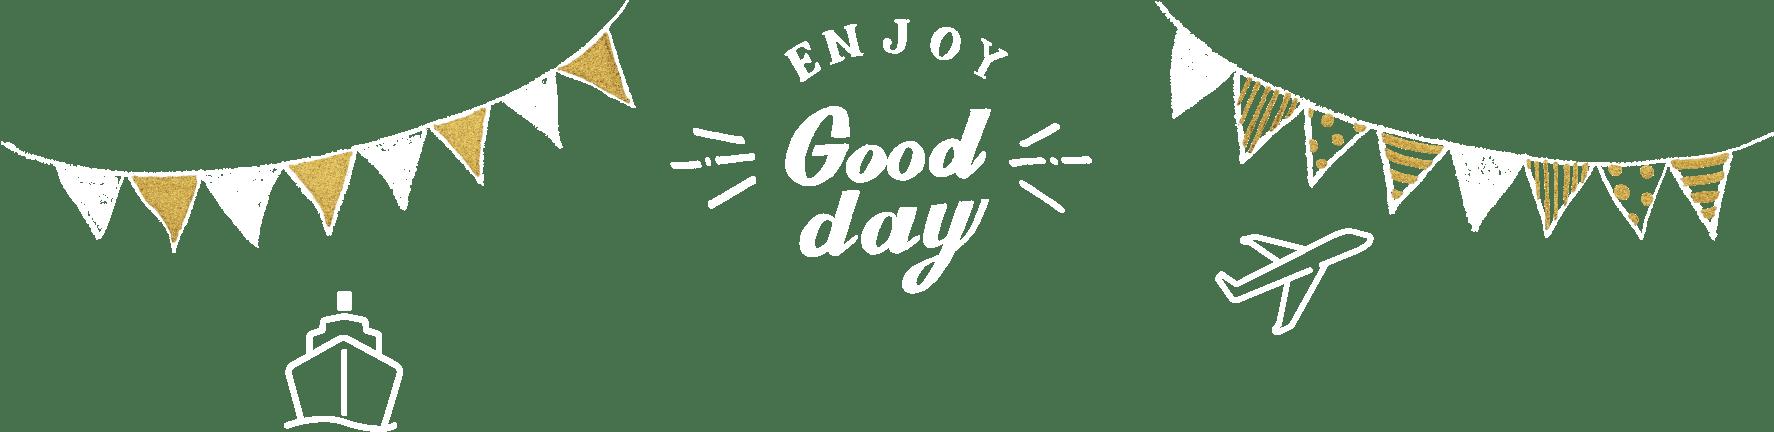 enjoy Good Day